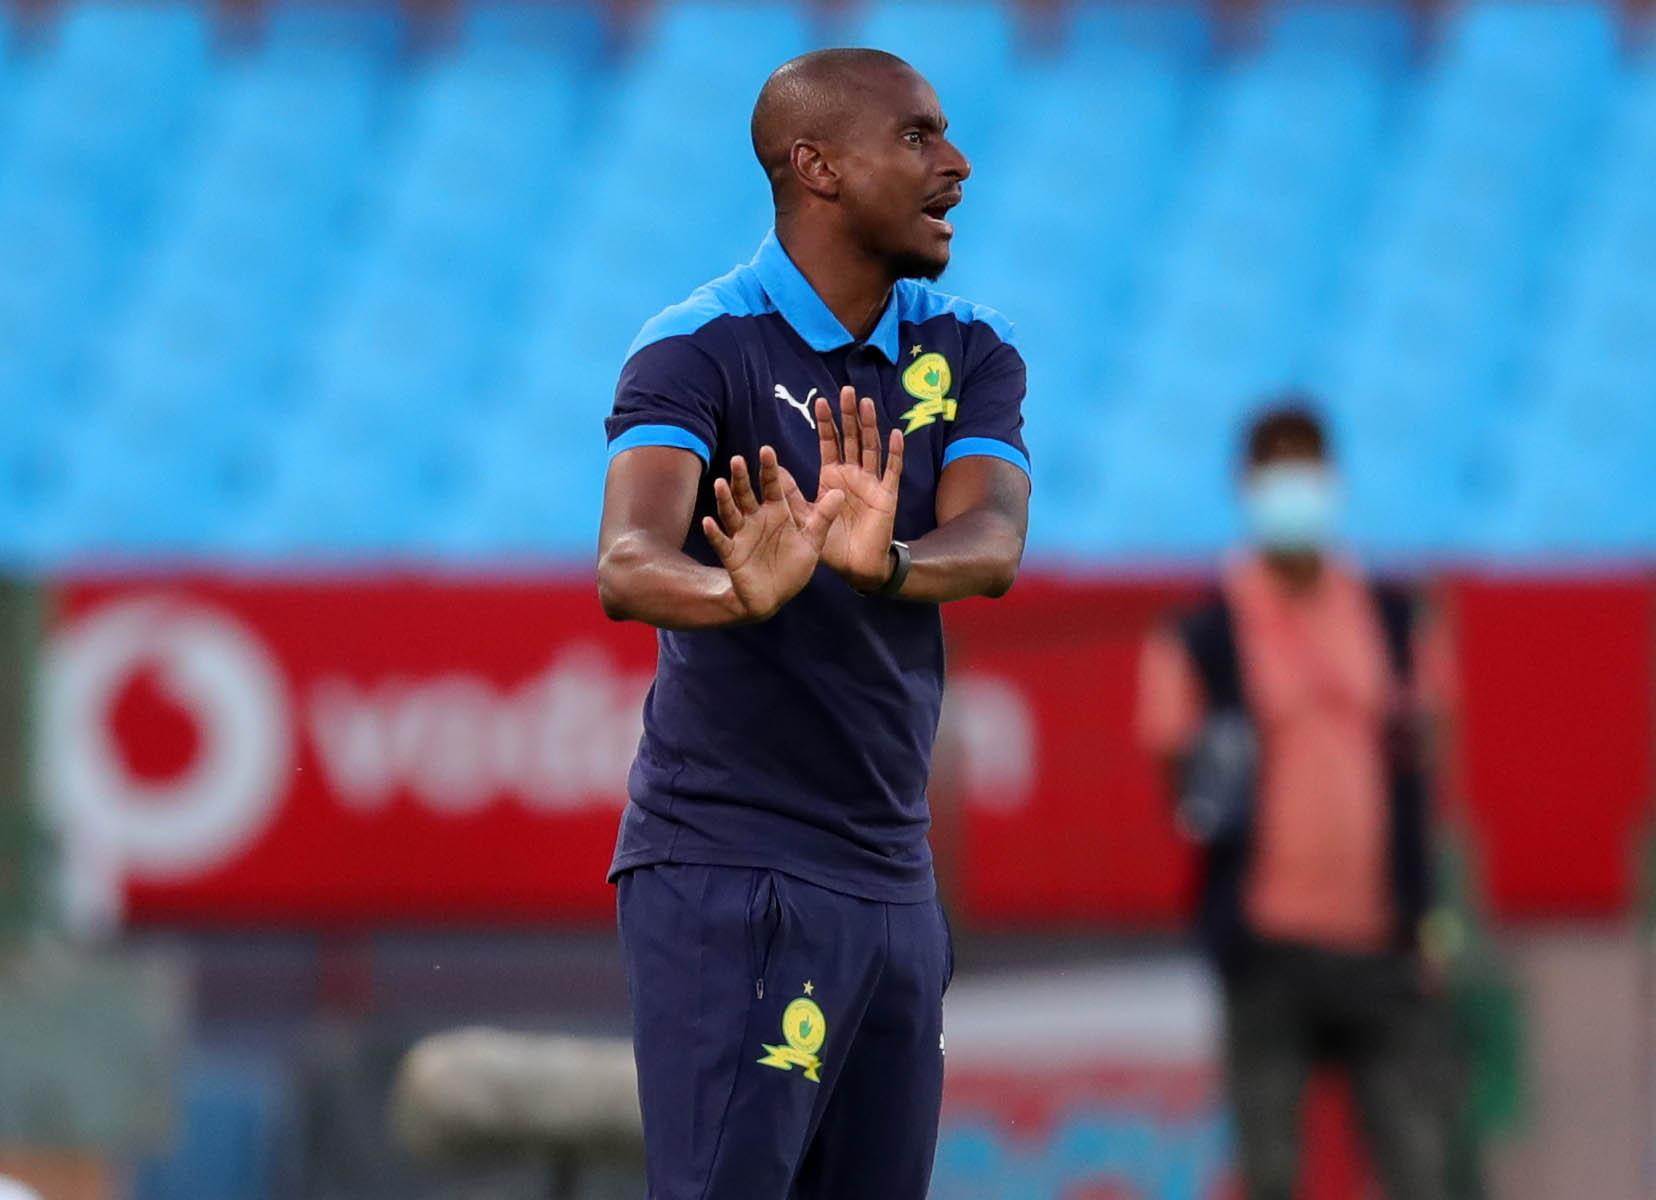 Mamelodi Sundowns' co-coach Rhulani Mokoena